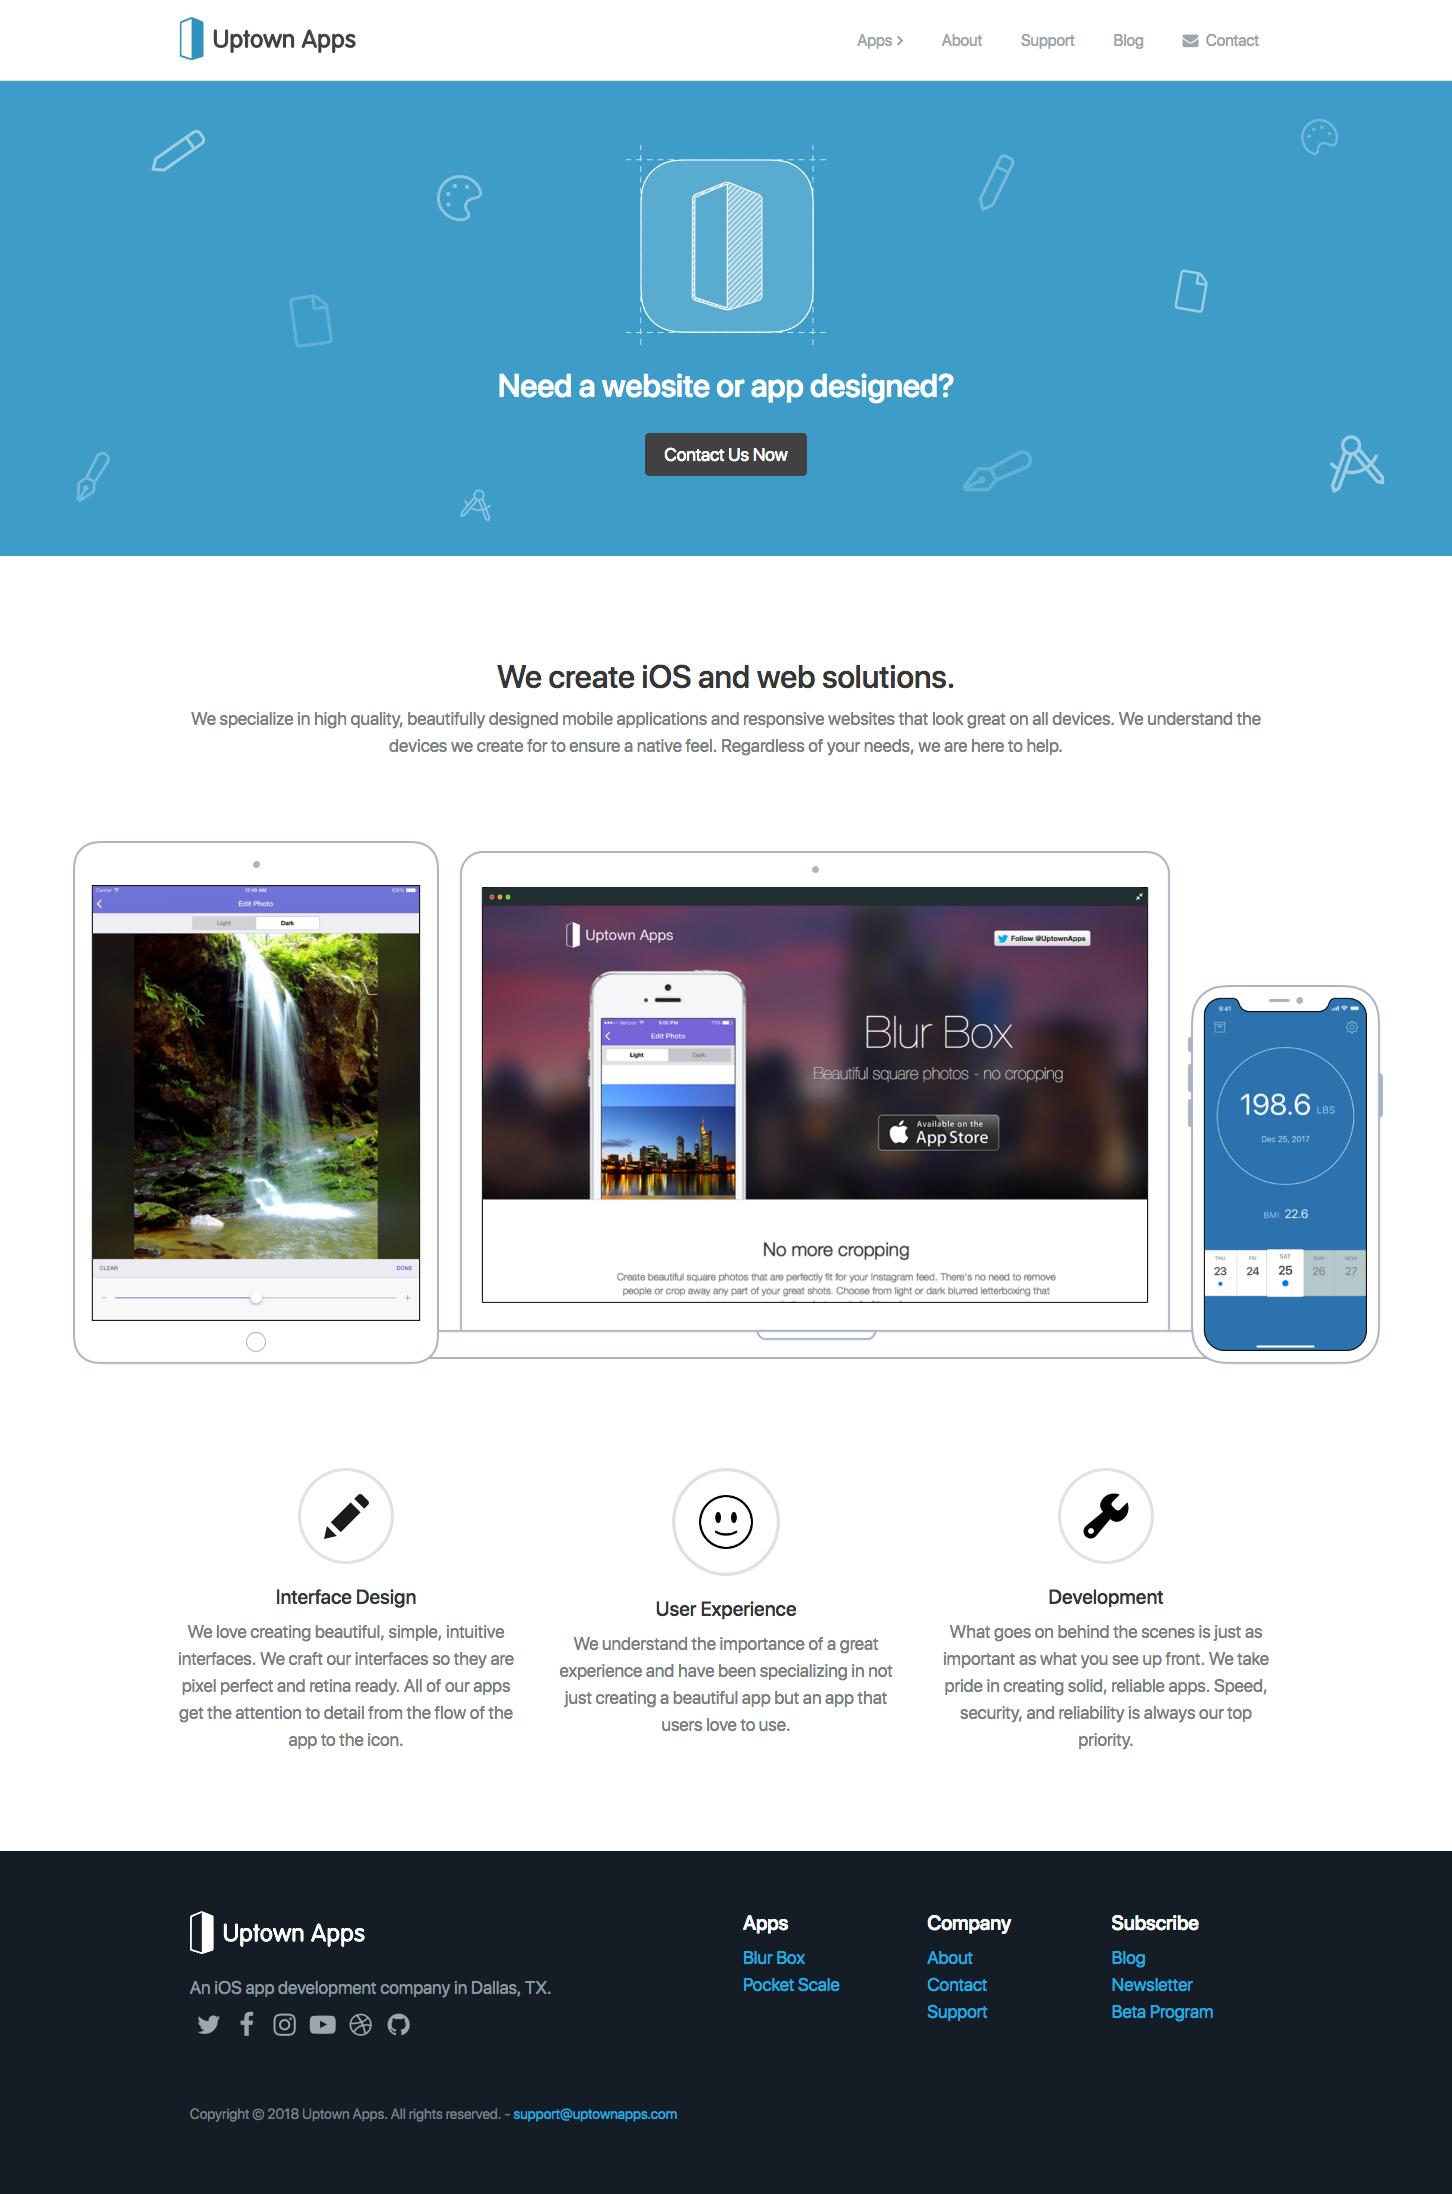 Uptownapps homepage